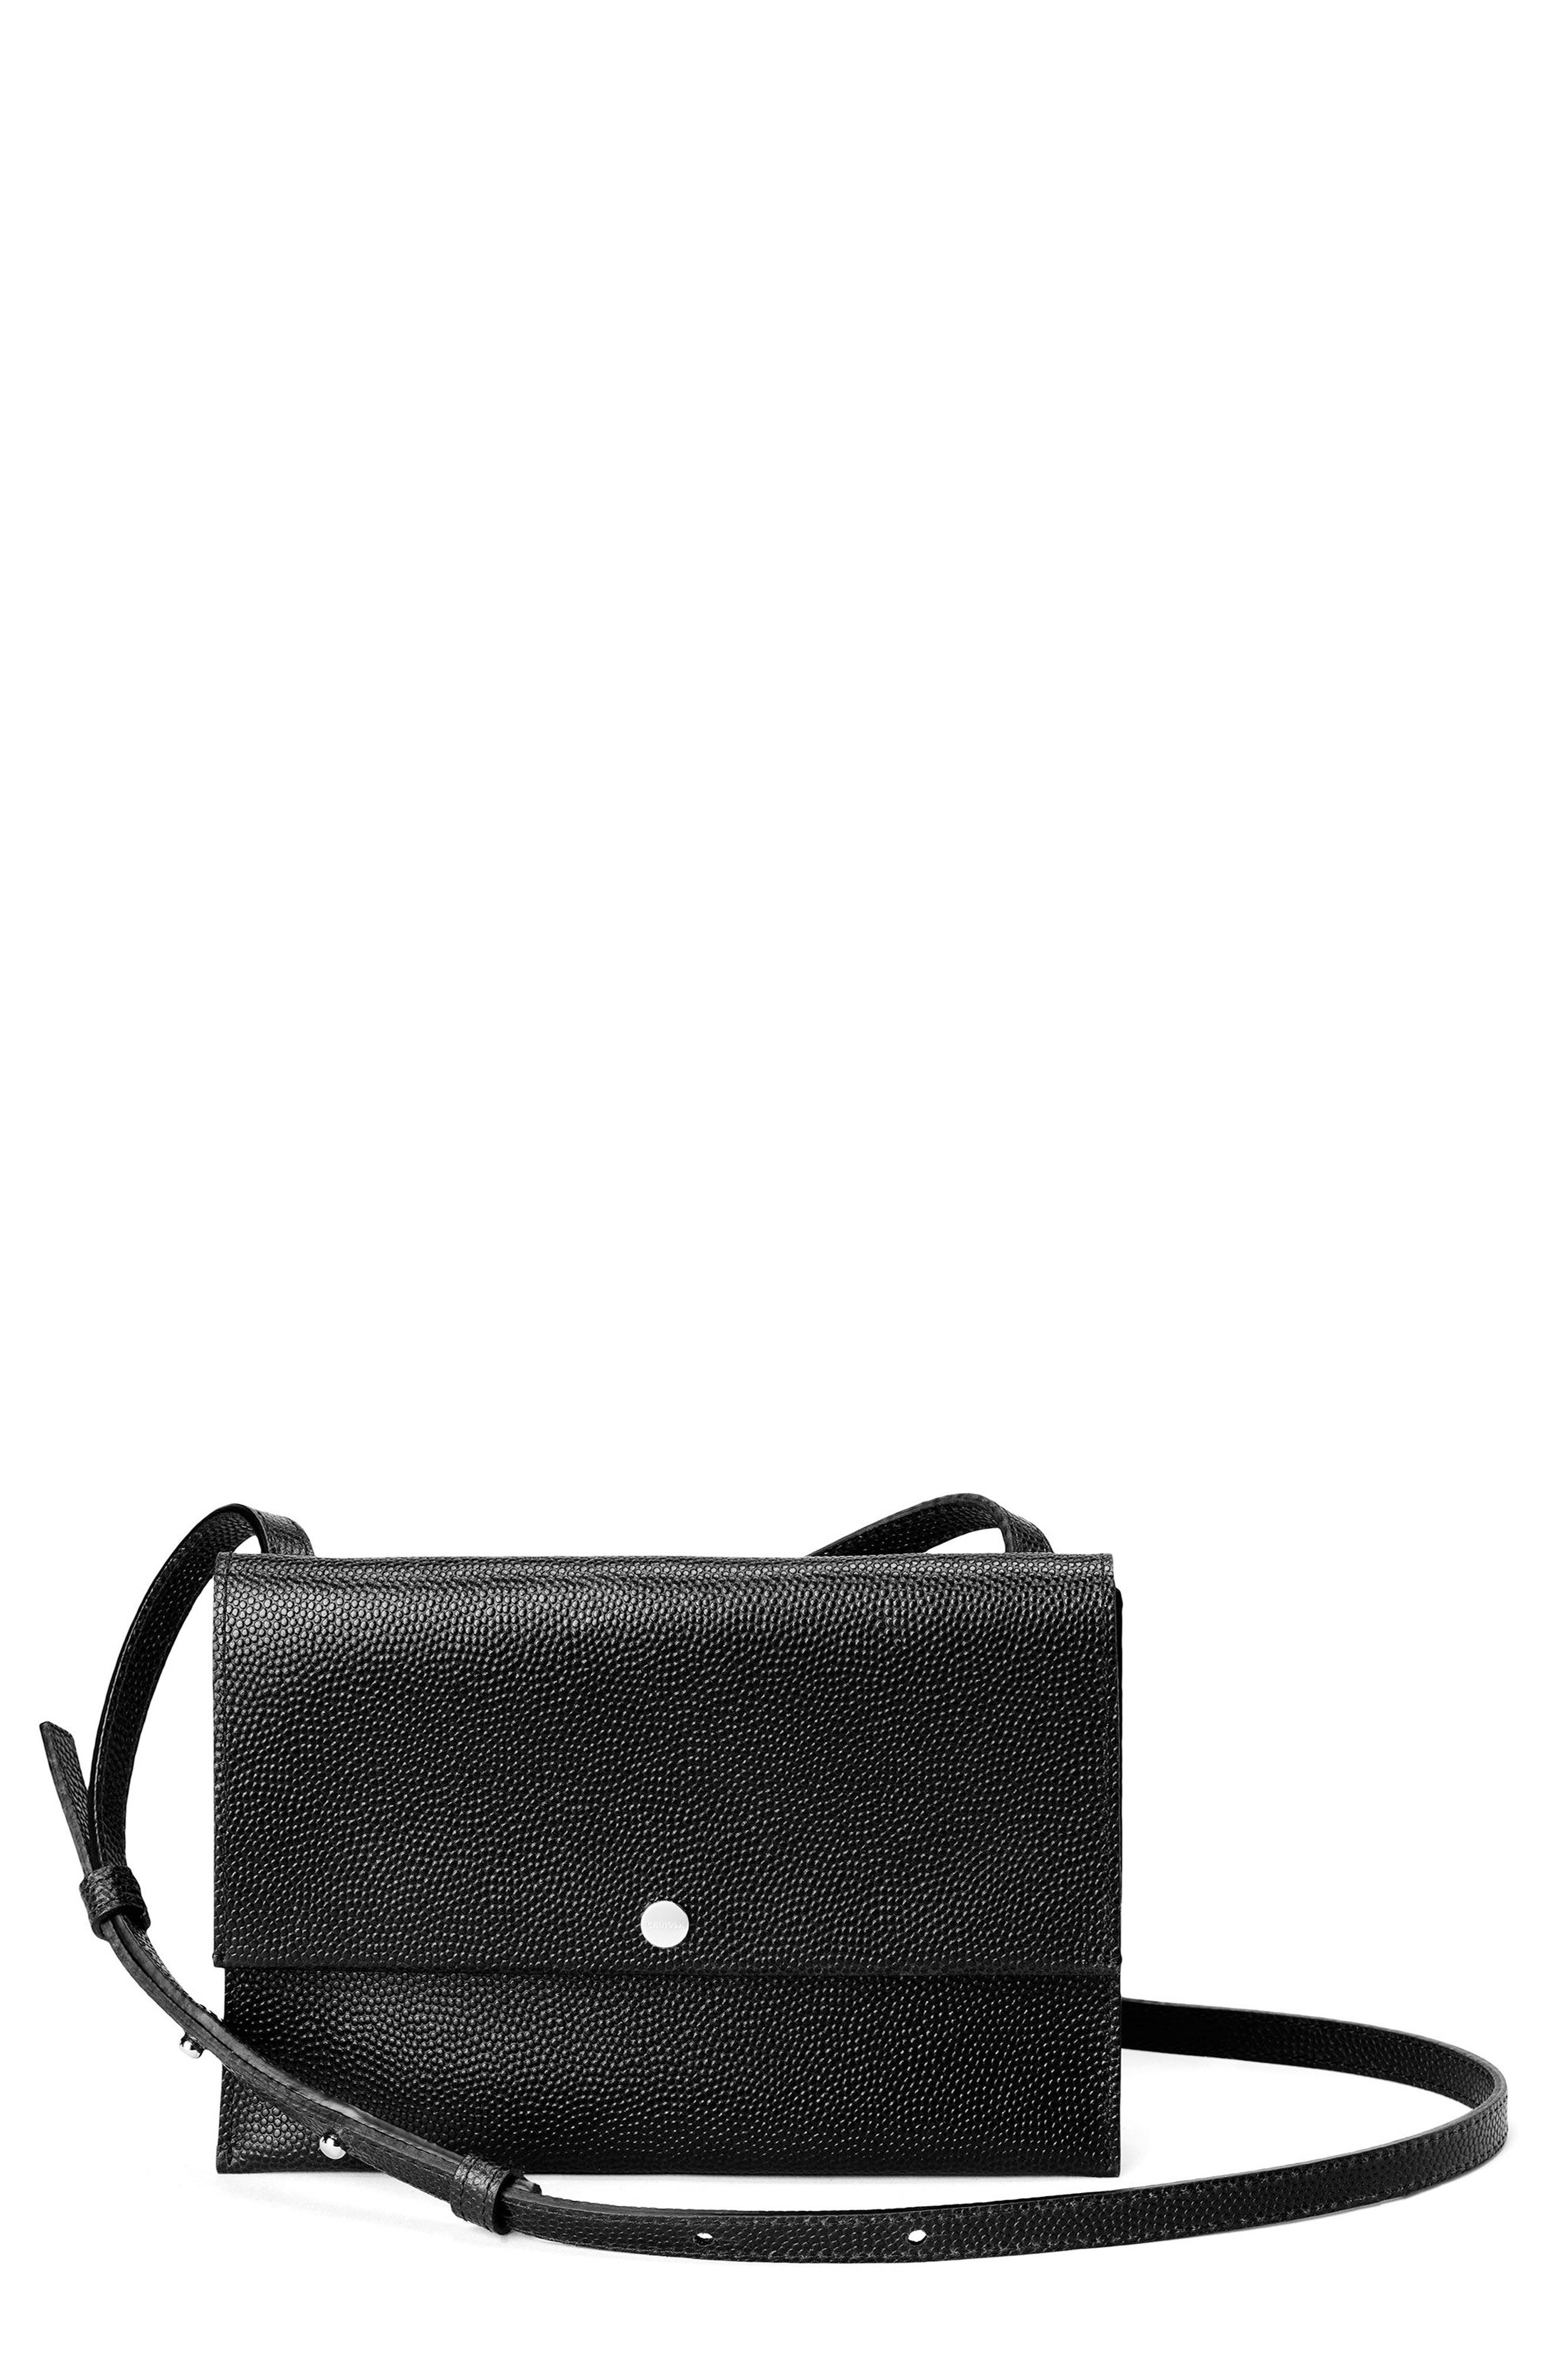 Leather Crossbody Bag,                             Main thumbnail 1, color,                             001